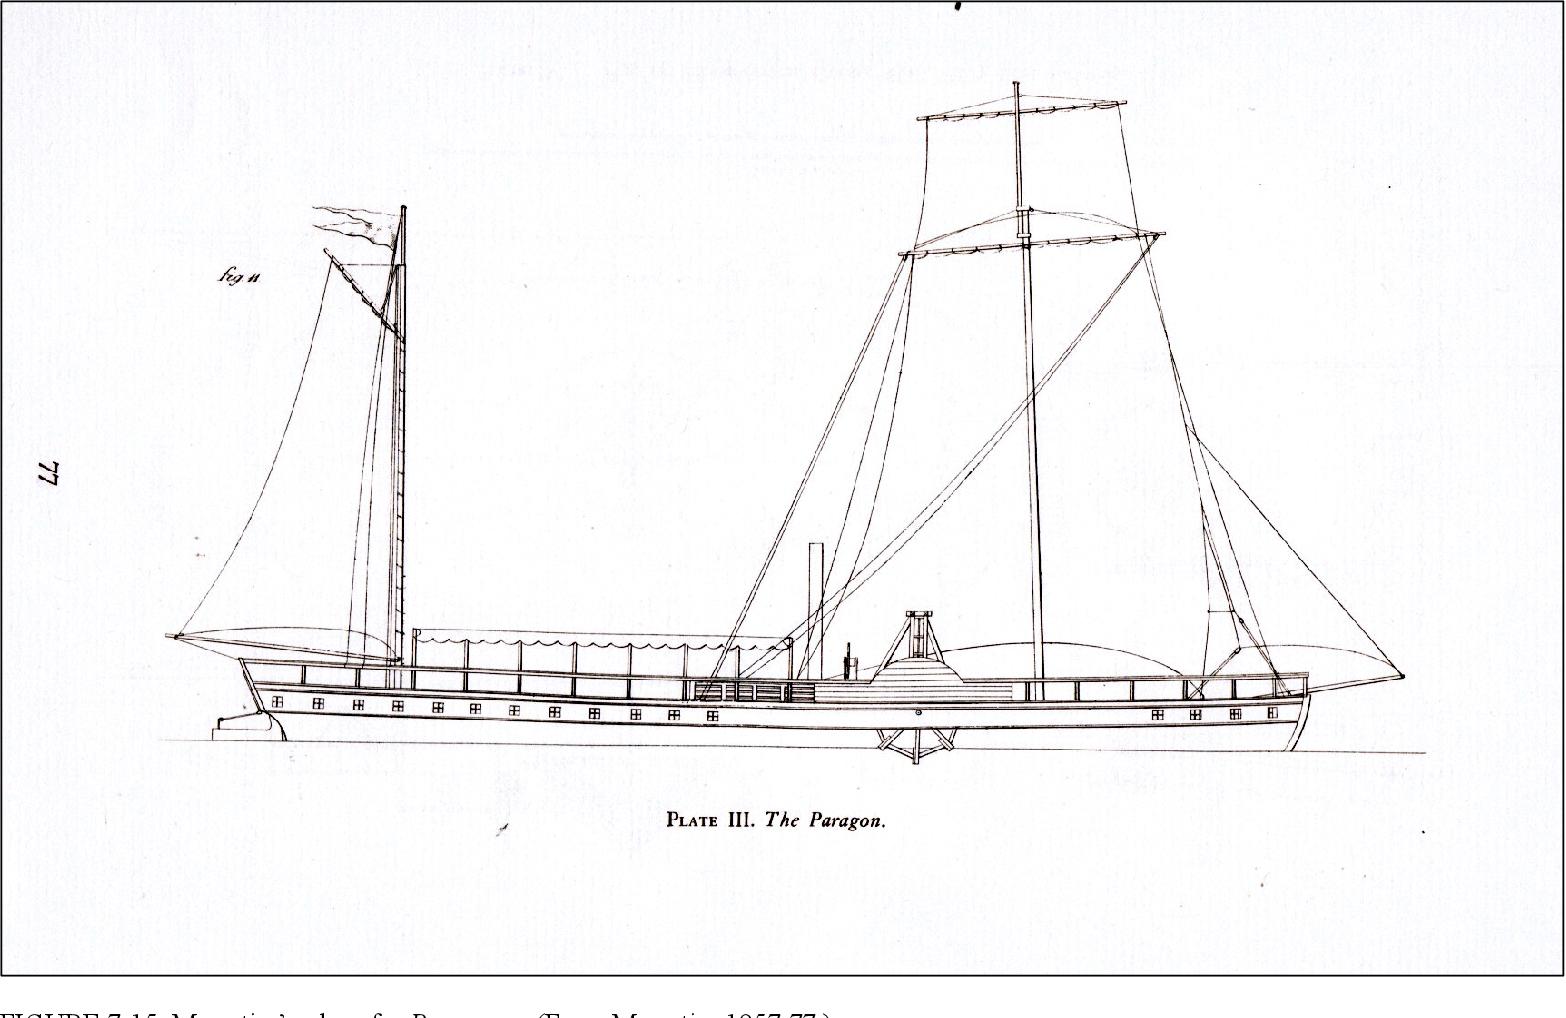 figure 7-15